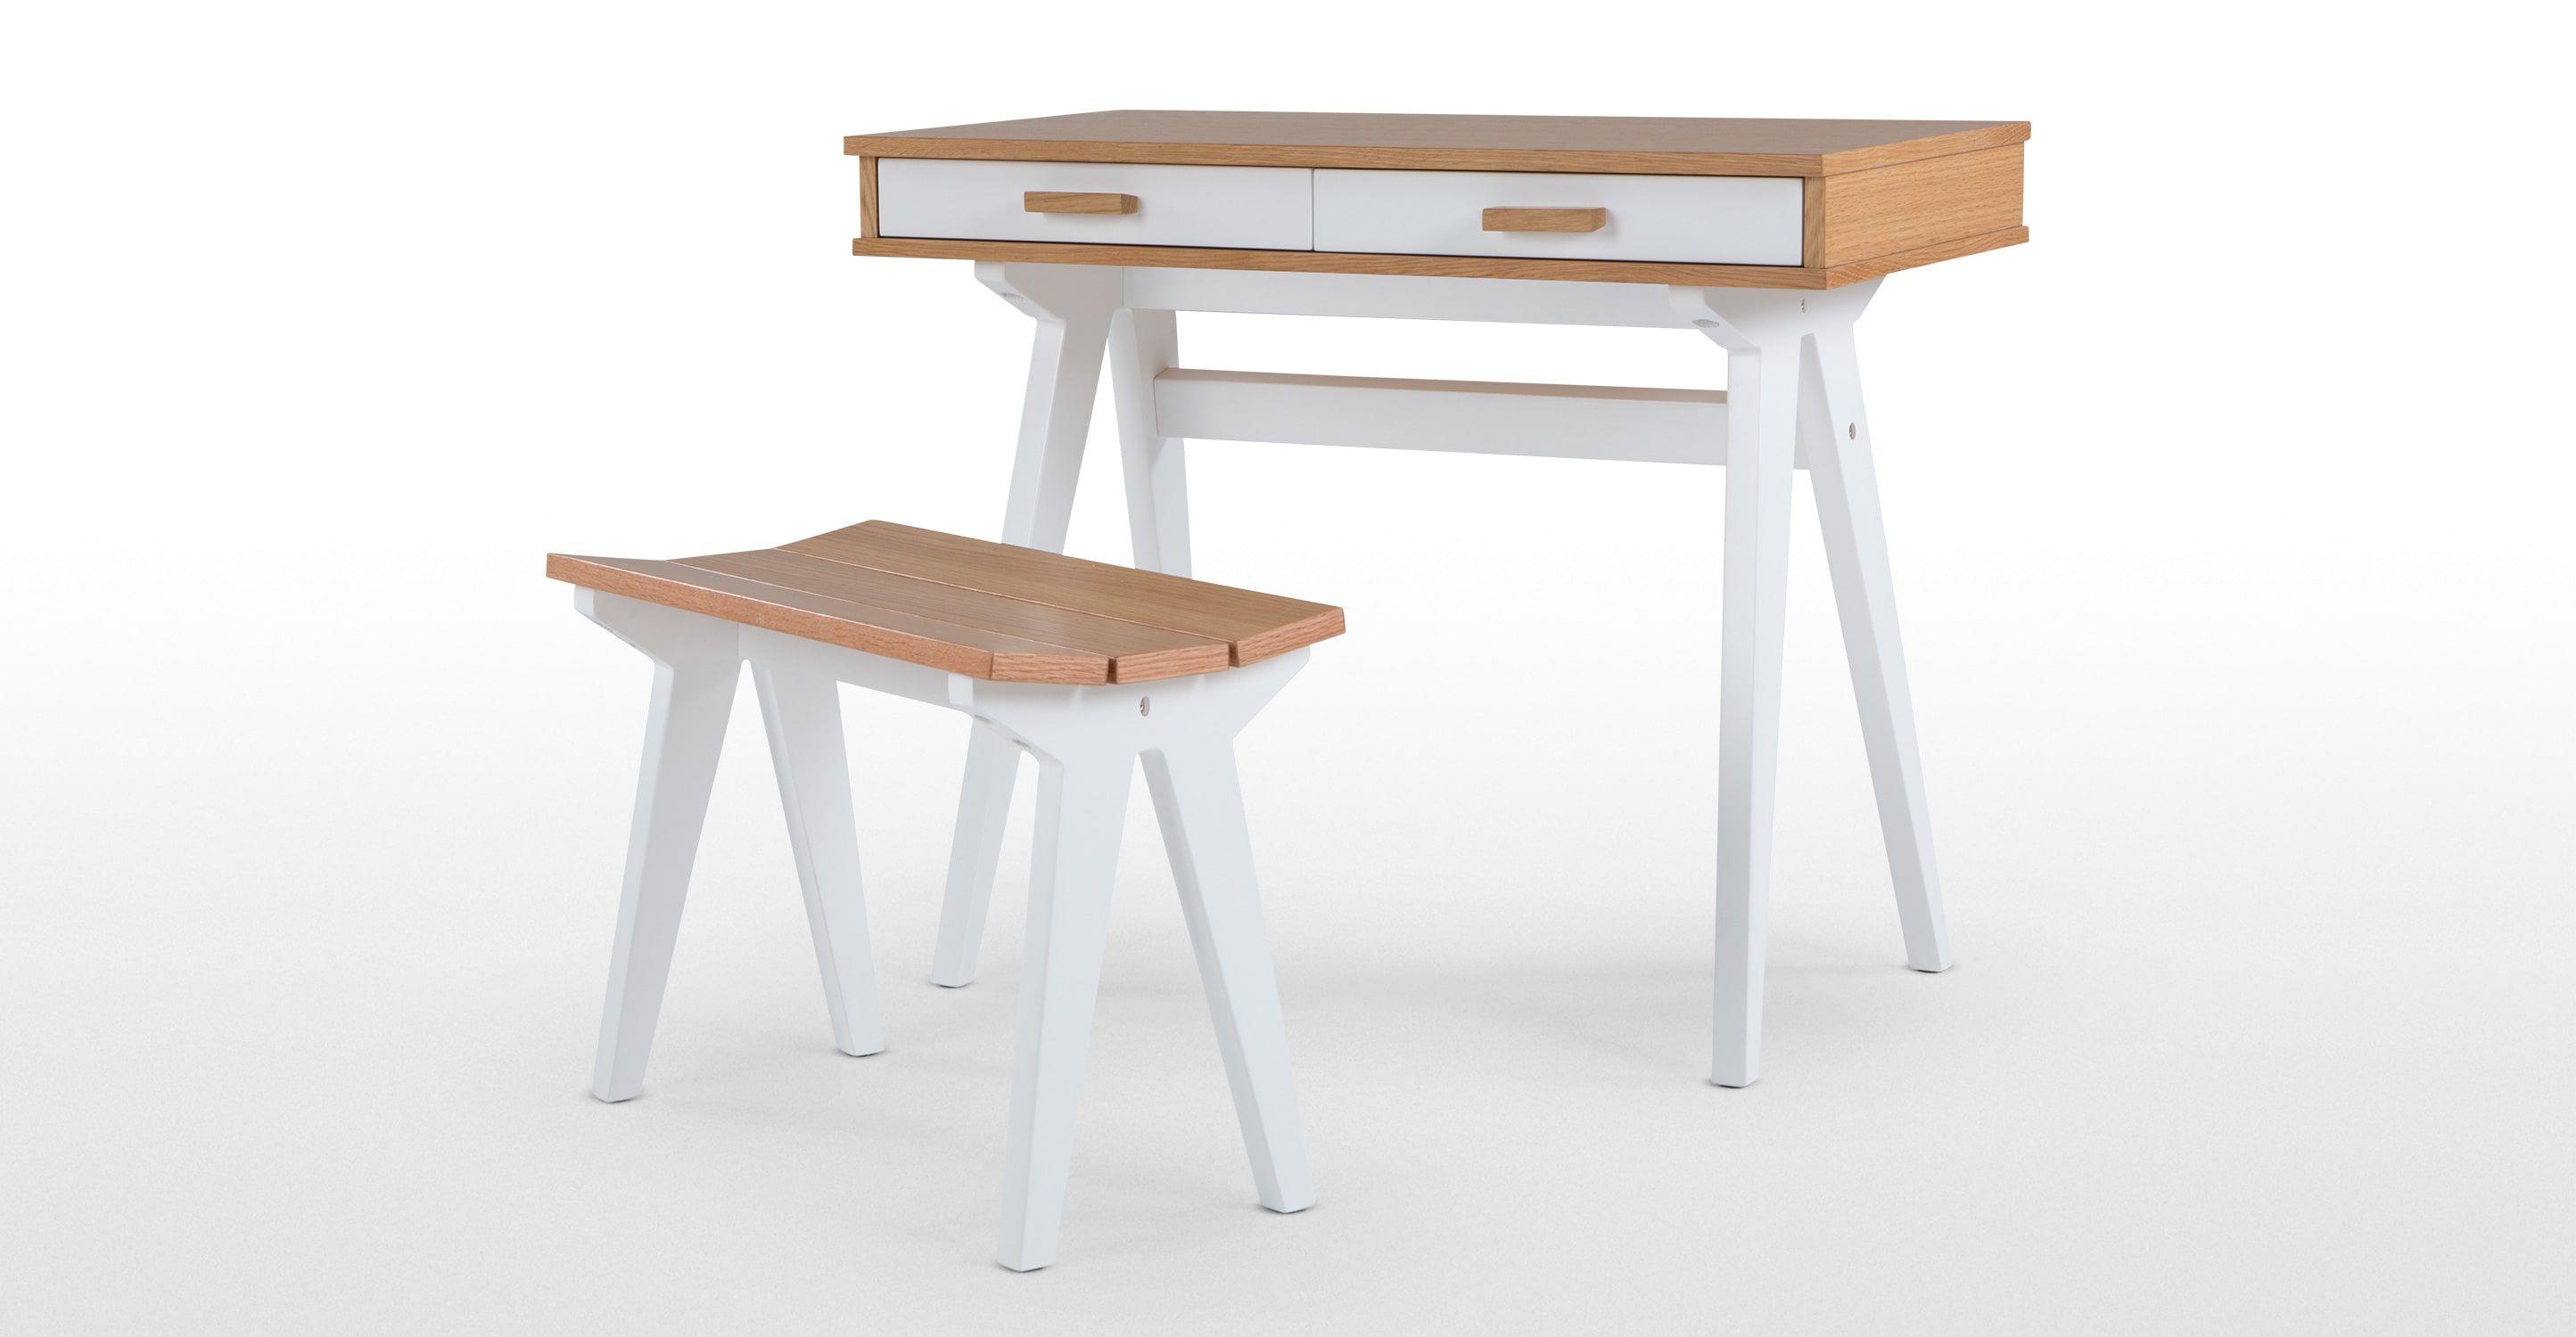 Mini Stroller Schreibtisch Fur Kinder Entdecke Moderne Designmobel Jetzt Bei Made Kid Desk Oak Made Com